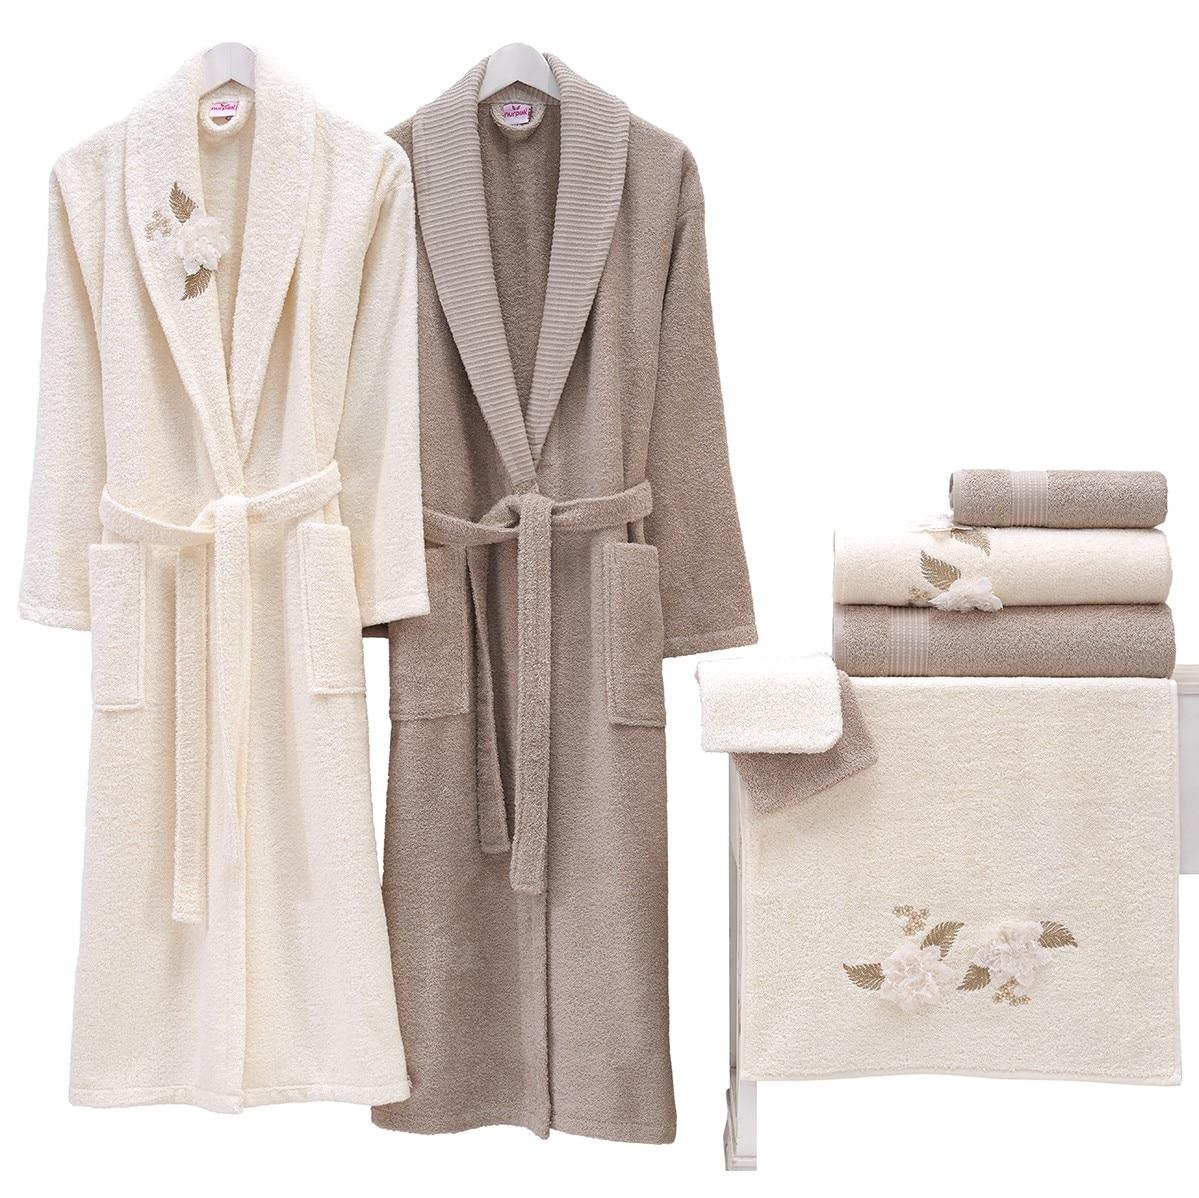 100% Cotton Towel Terry Bathrobe Set From Turkey, For Women/ Man, Winter, lovers Soft Bath Robe Nightrobe Casual Home, Family